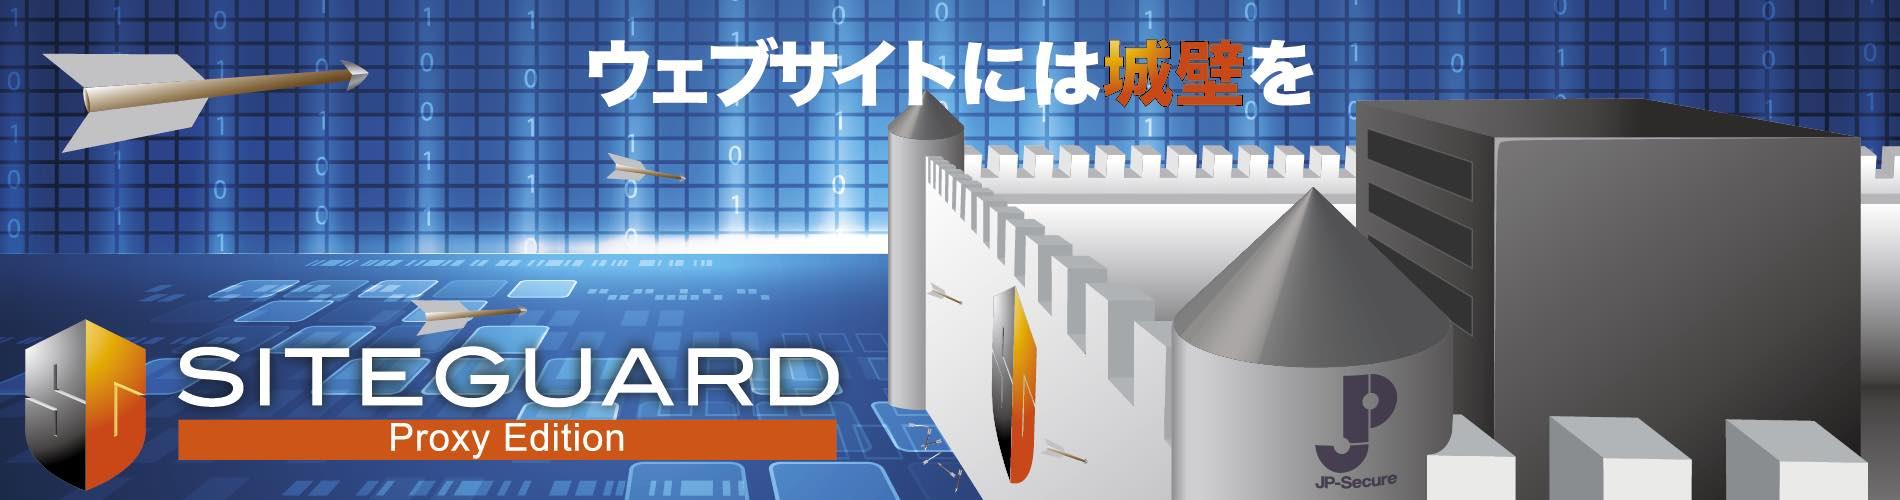 SiteGuard_トップ_メイン